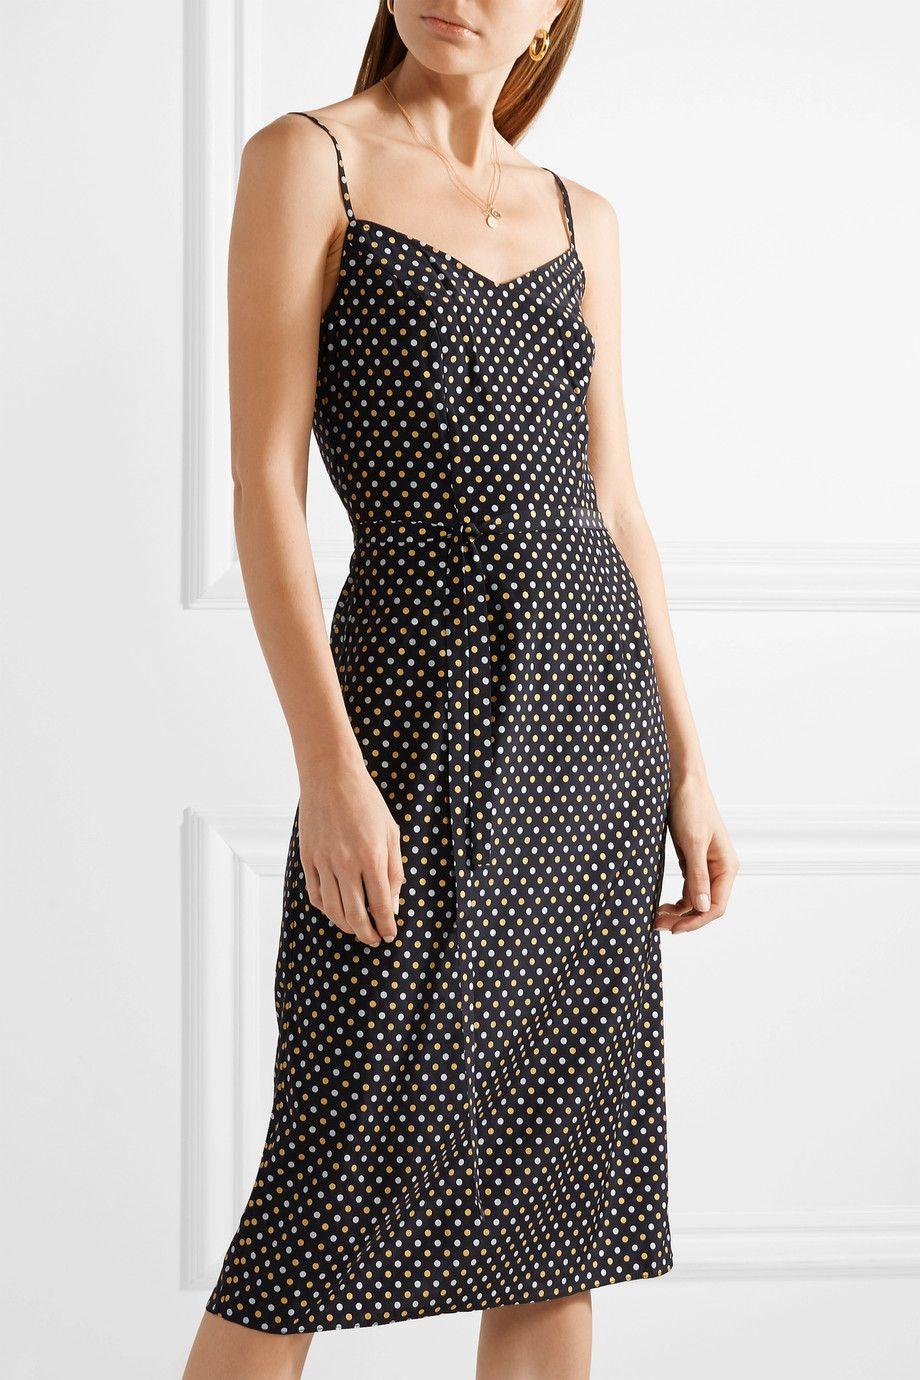 Lily Metallic Polka-dot Silk Crepe De Chine Dress - Black HVN 3pcCUddFoK